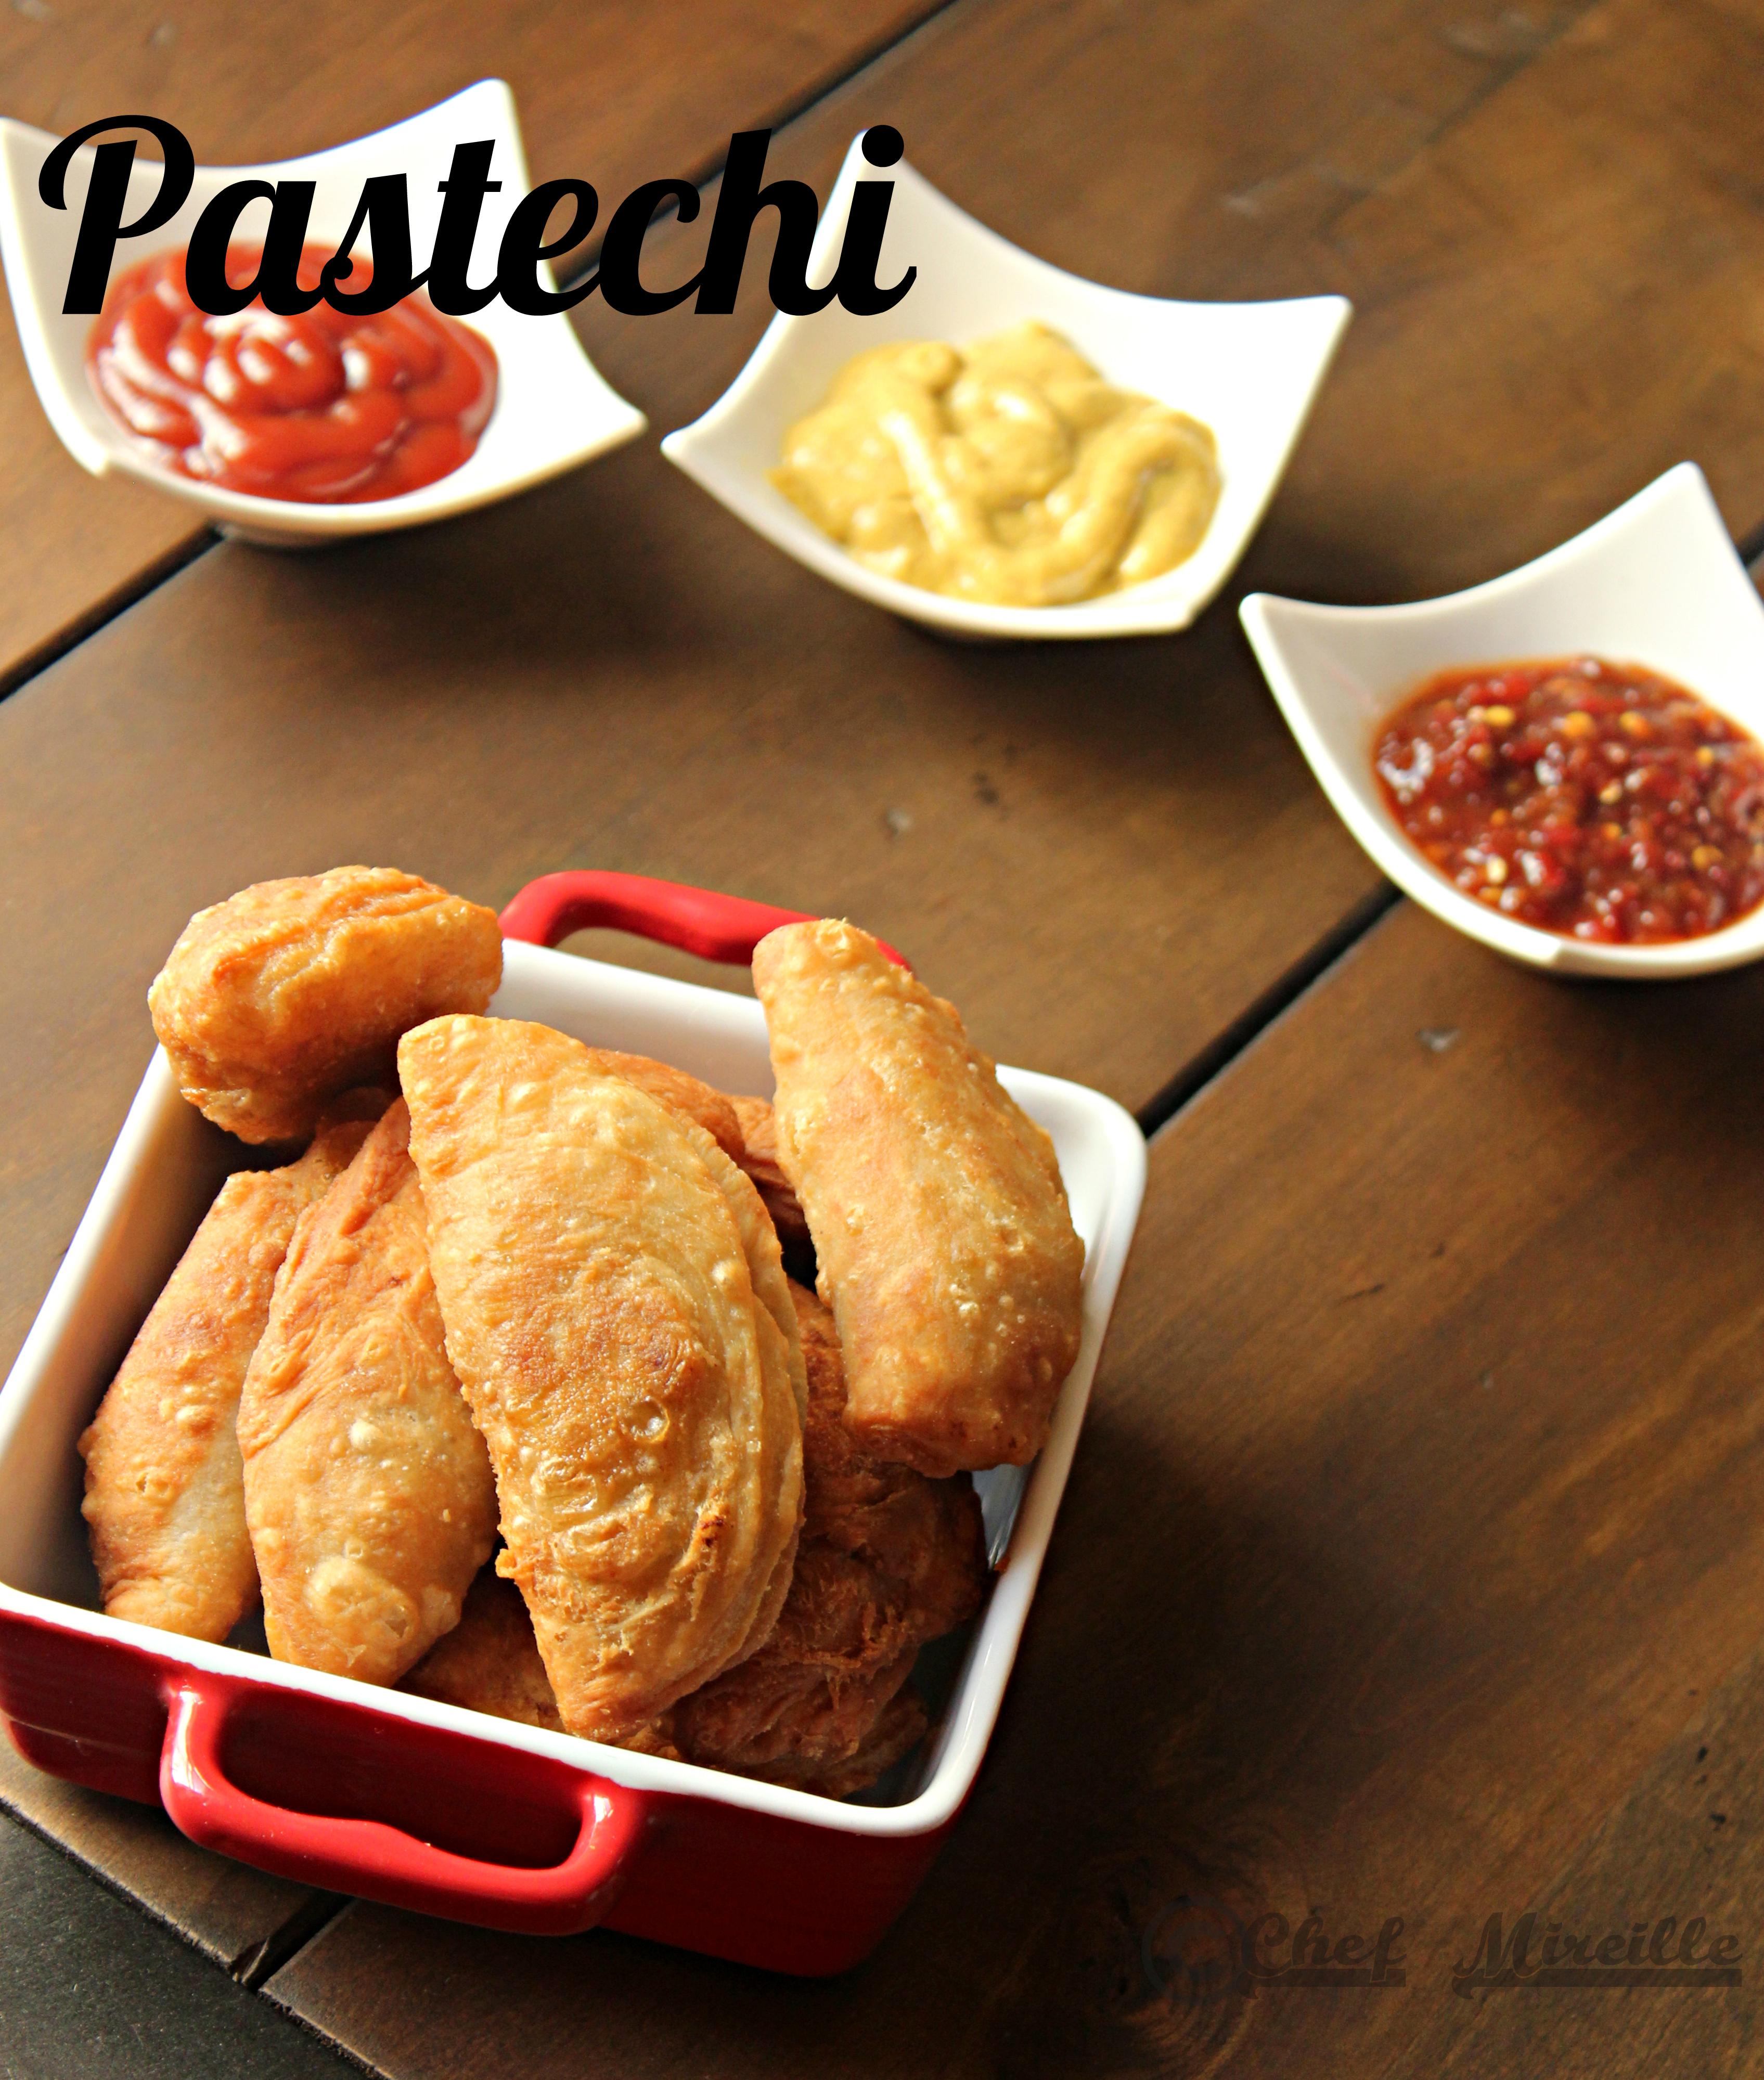 Pastechi - Aruba style  Empanadas with condiments